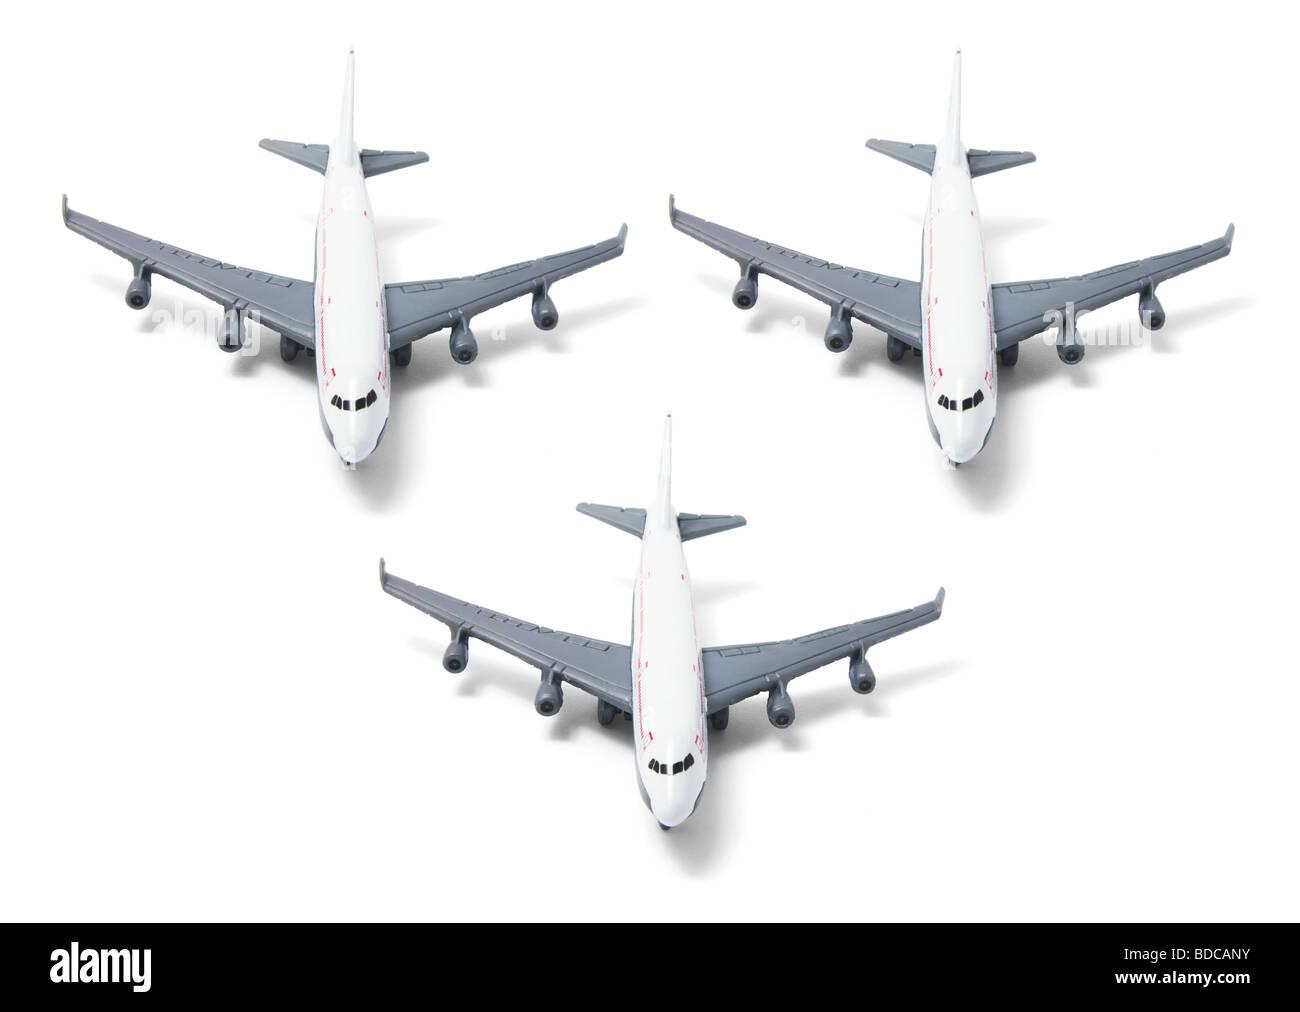 Plane Models Stock Photo